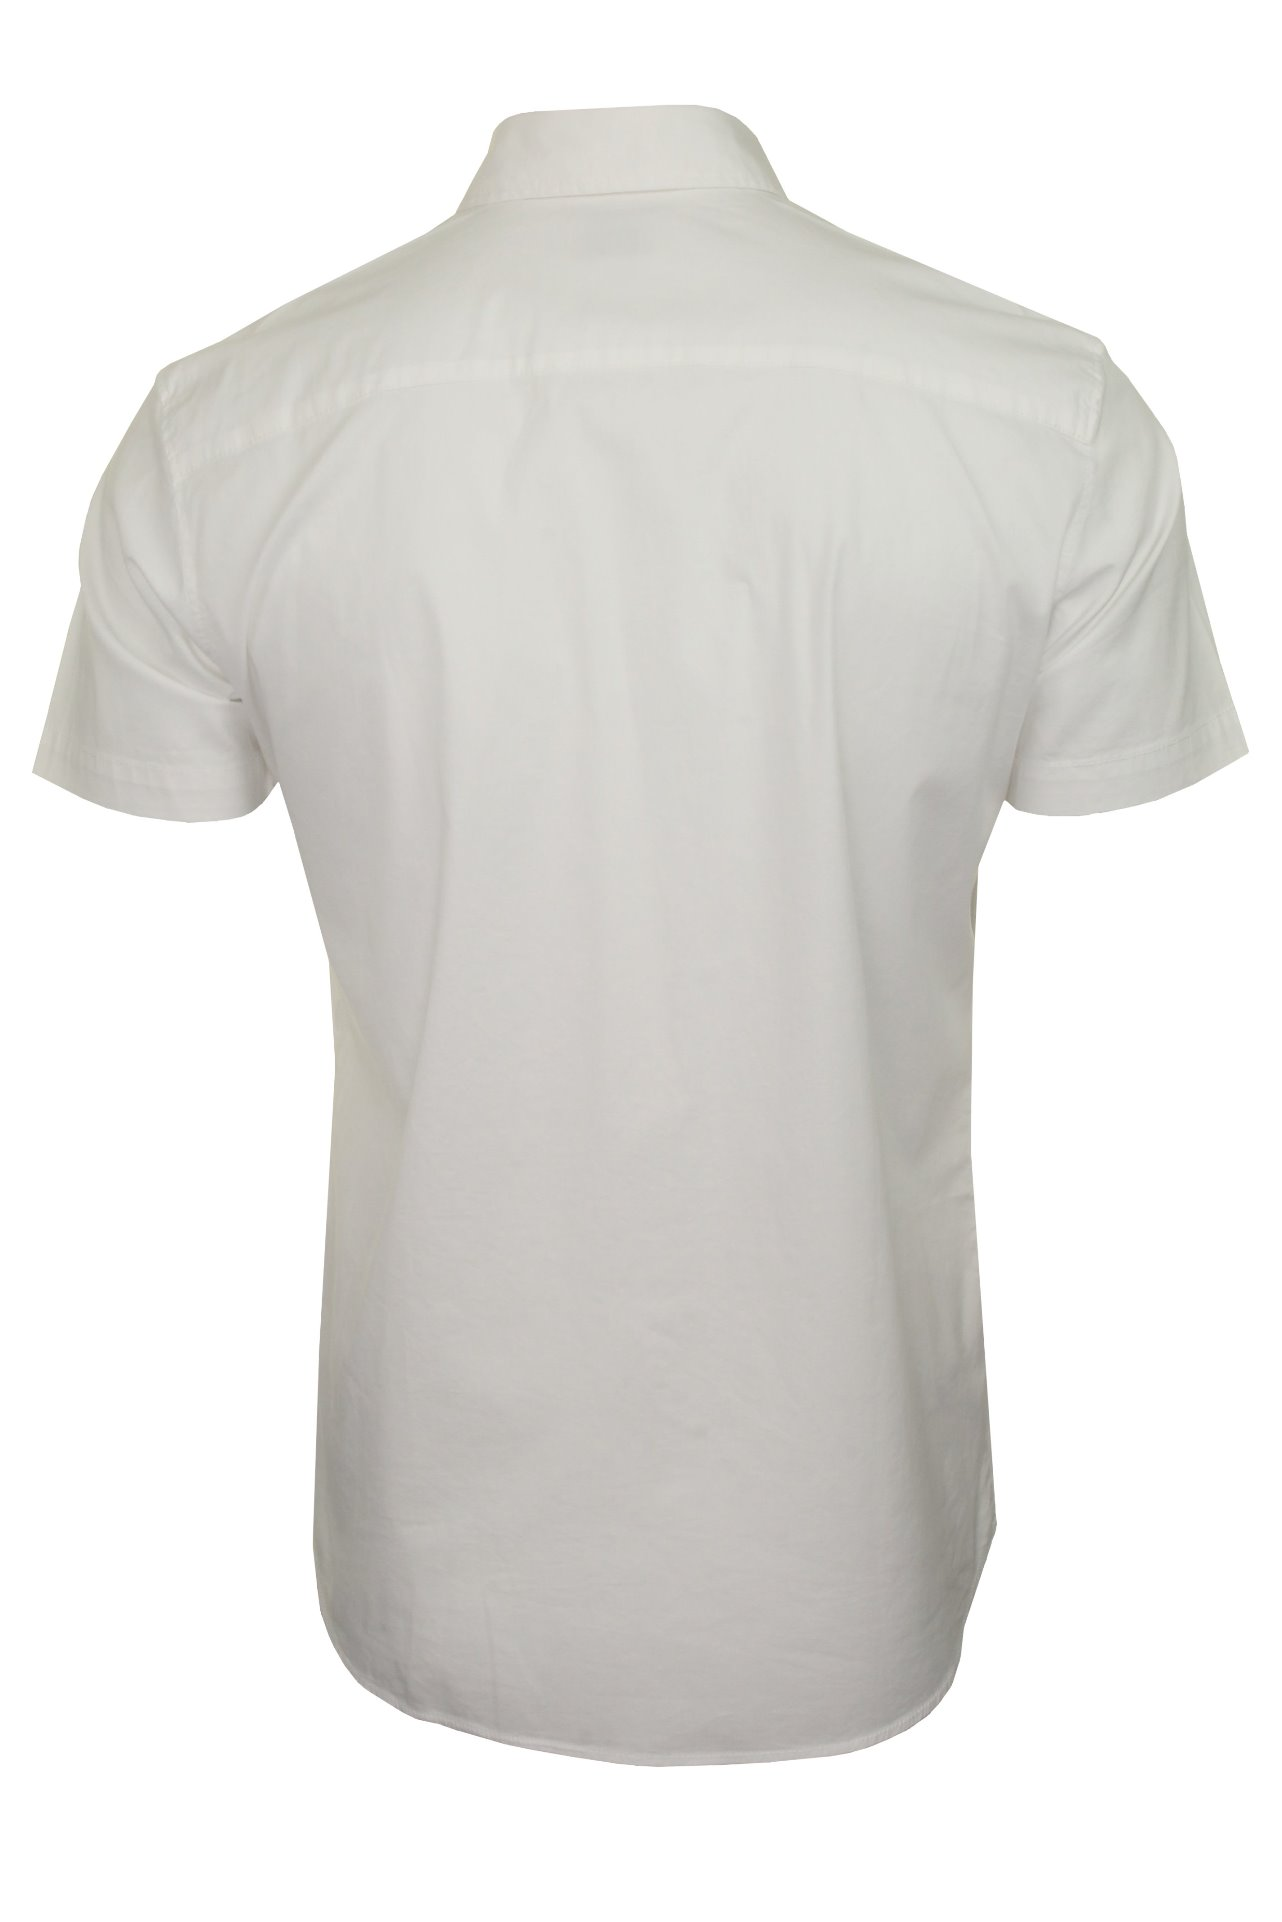 Jack-amp-Jones-Mens-039-Clint-039-Poplin-Shirt-Short-Sleeved thumbnail 14